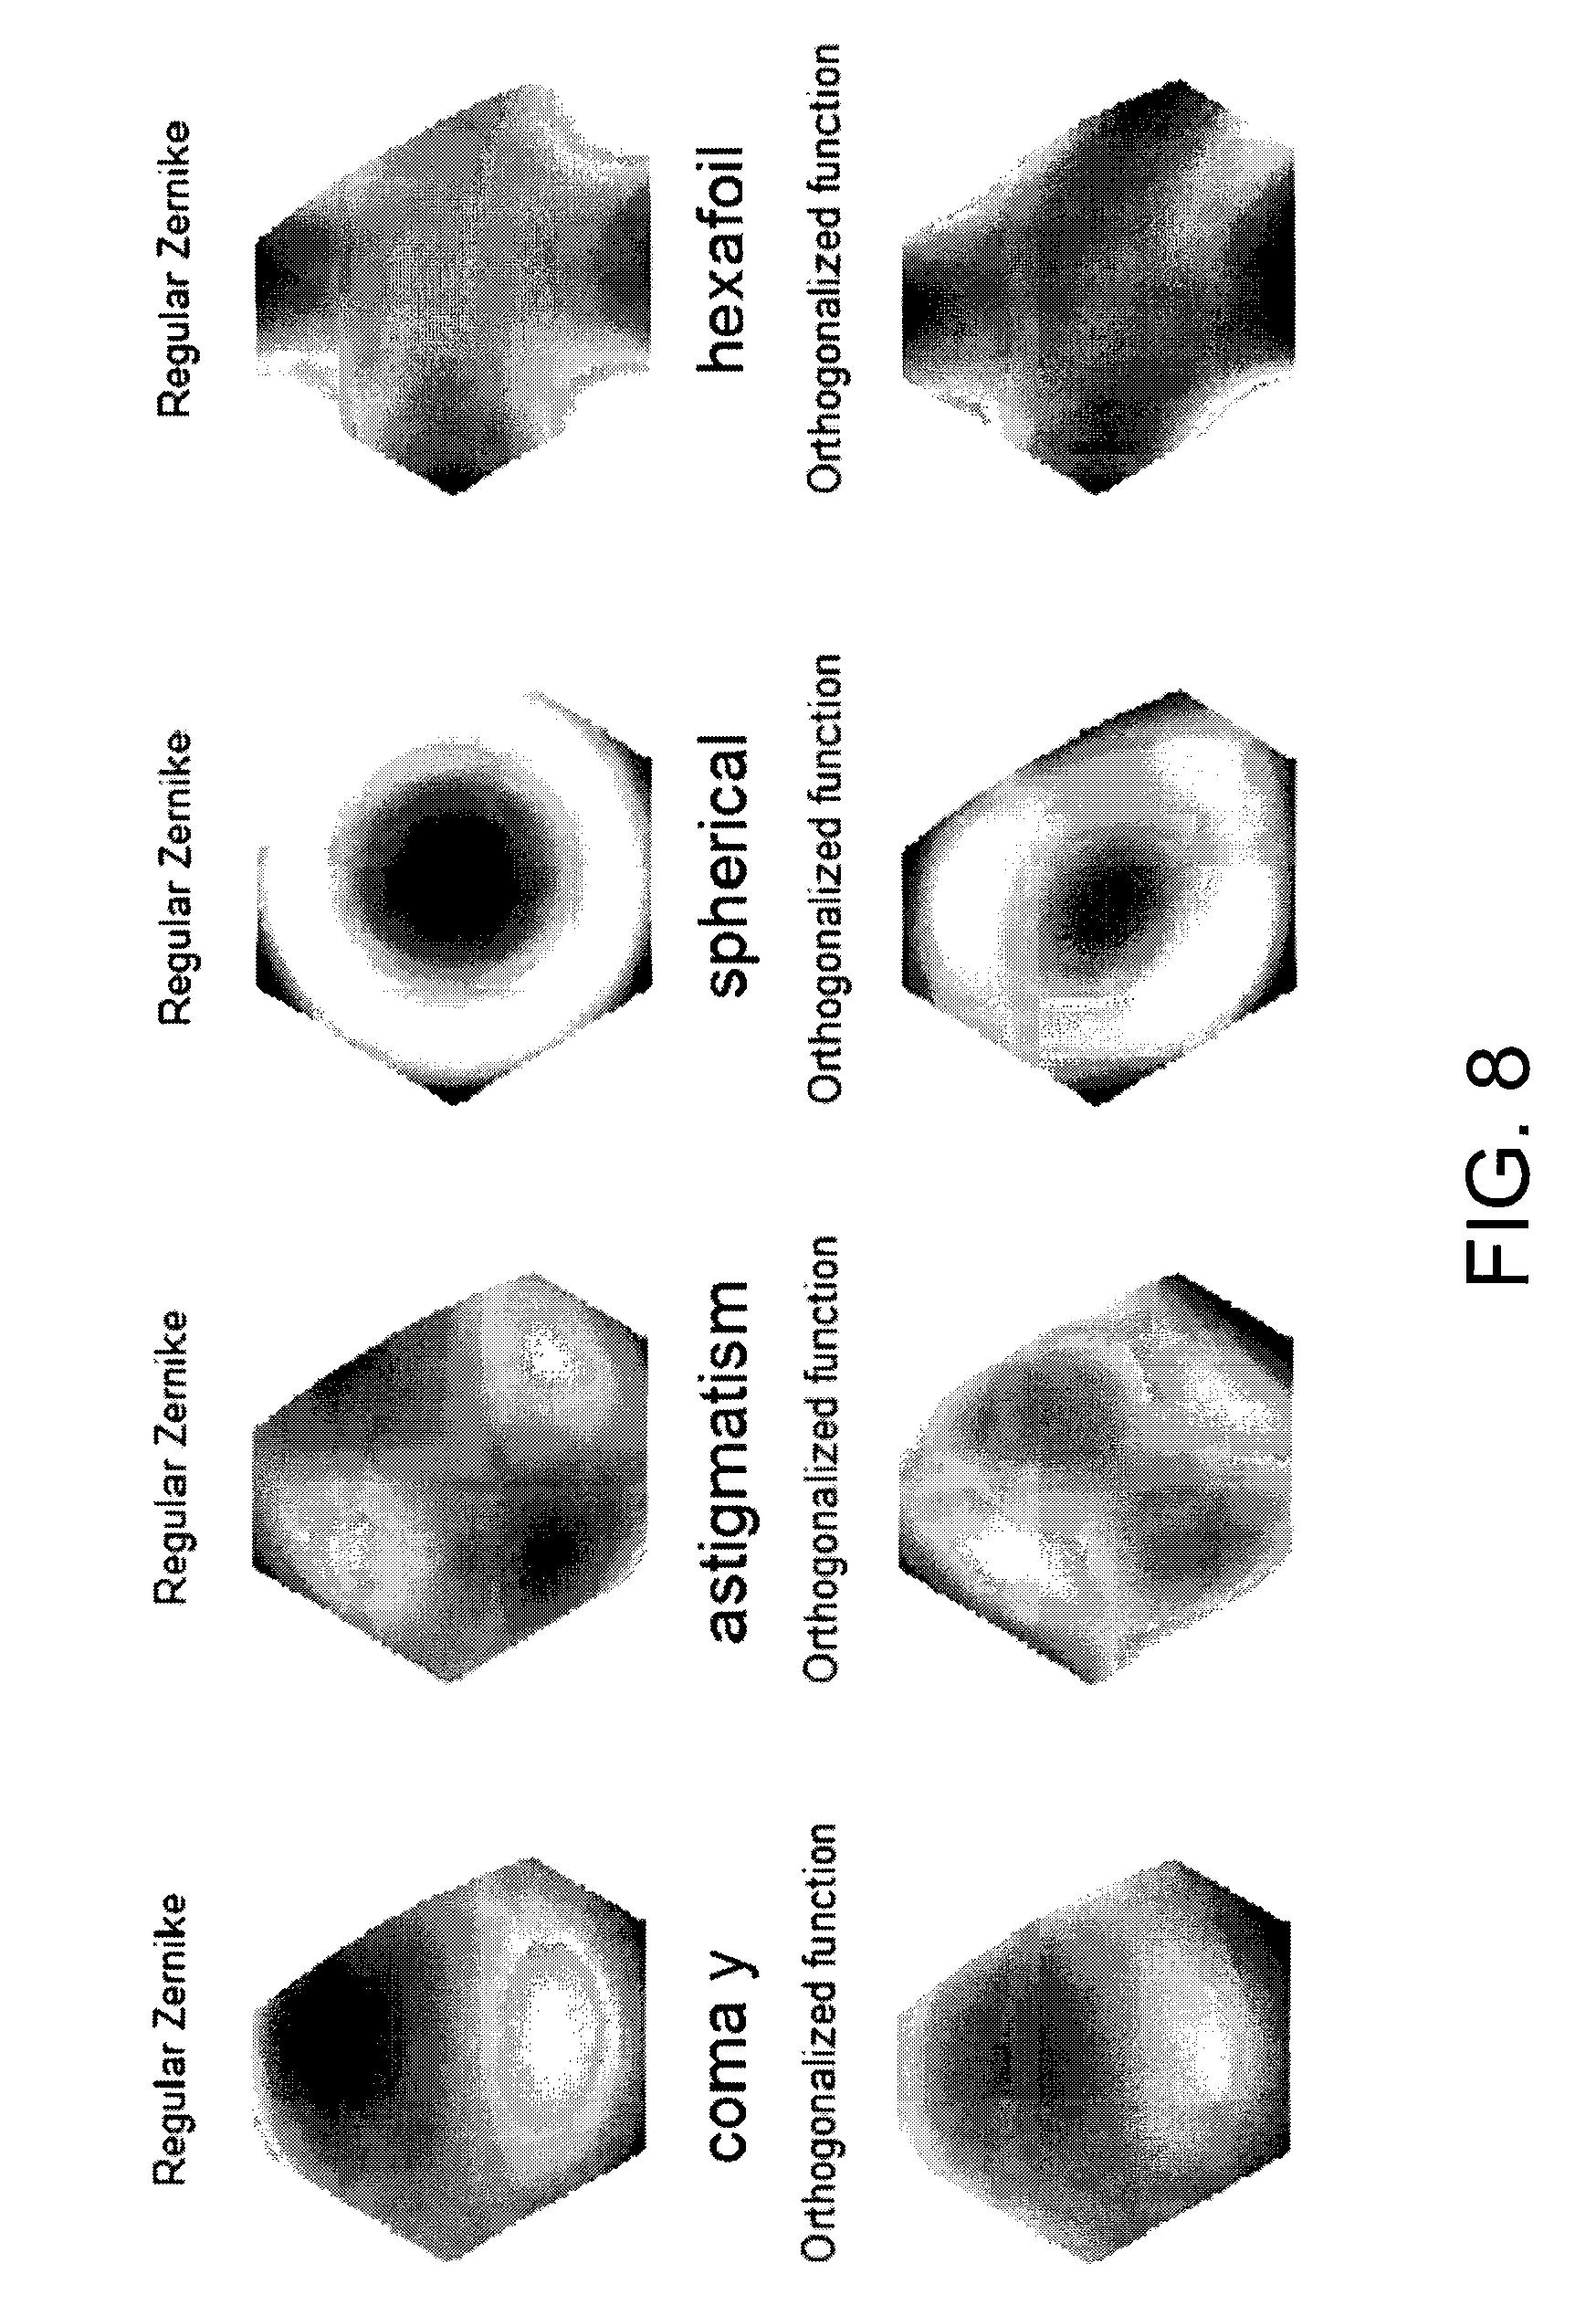 diversity technique Journal of lightwave technology, vol lt-5, no 4, april 1987 561 phase diversity techniques for coherent optical receivers a w davis, m j pettitt, j p king, and s wright abstruct-in the present state of the art, coherent optical receivers.